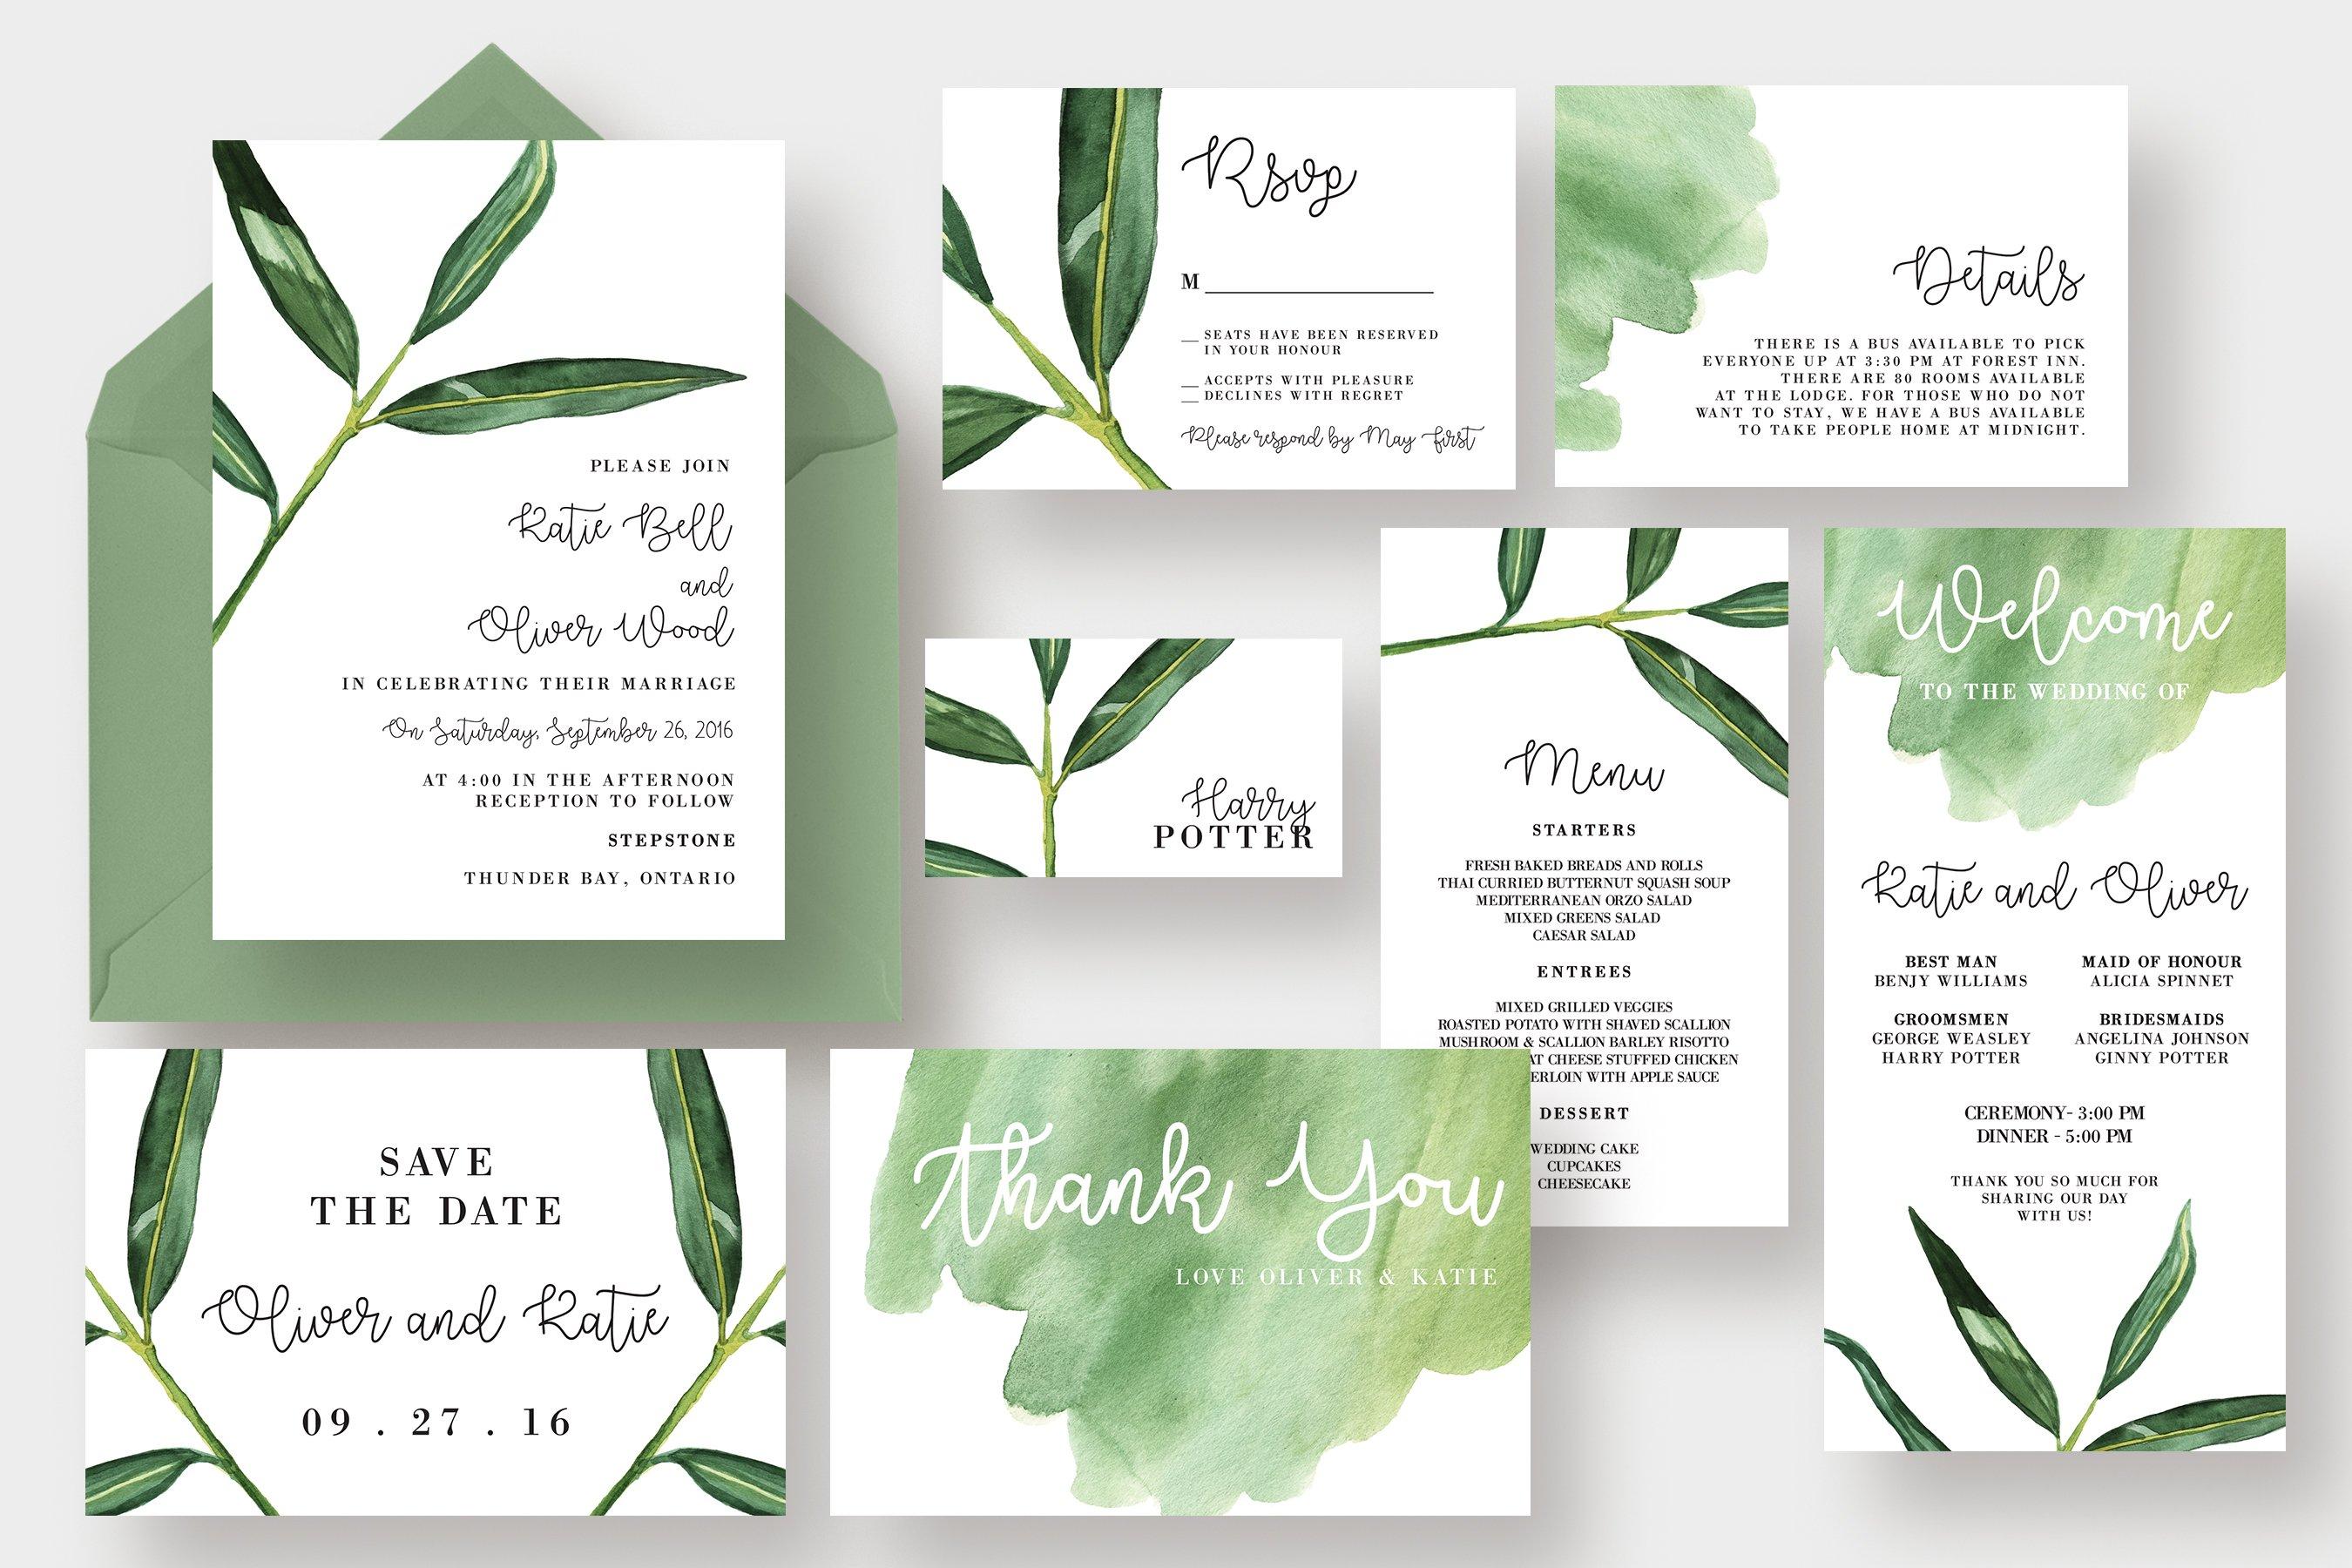 Watercolor Leaf Wedding Suite ~ Invitation Templates ~ Creative Market